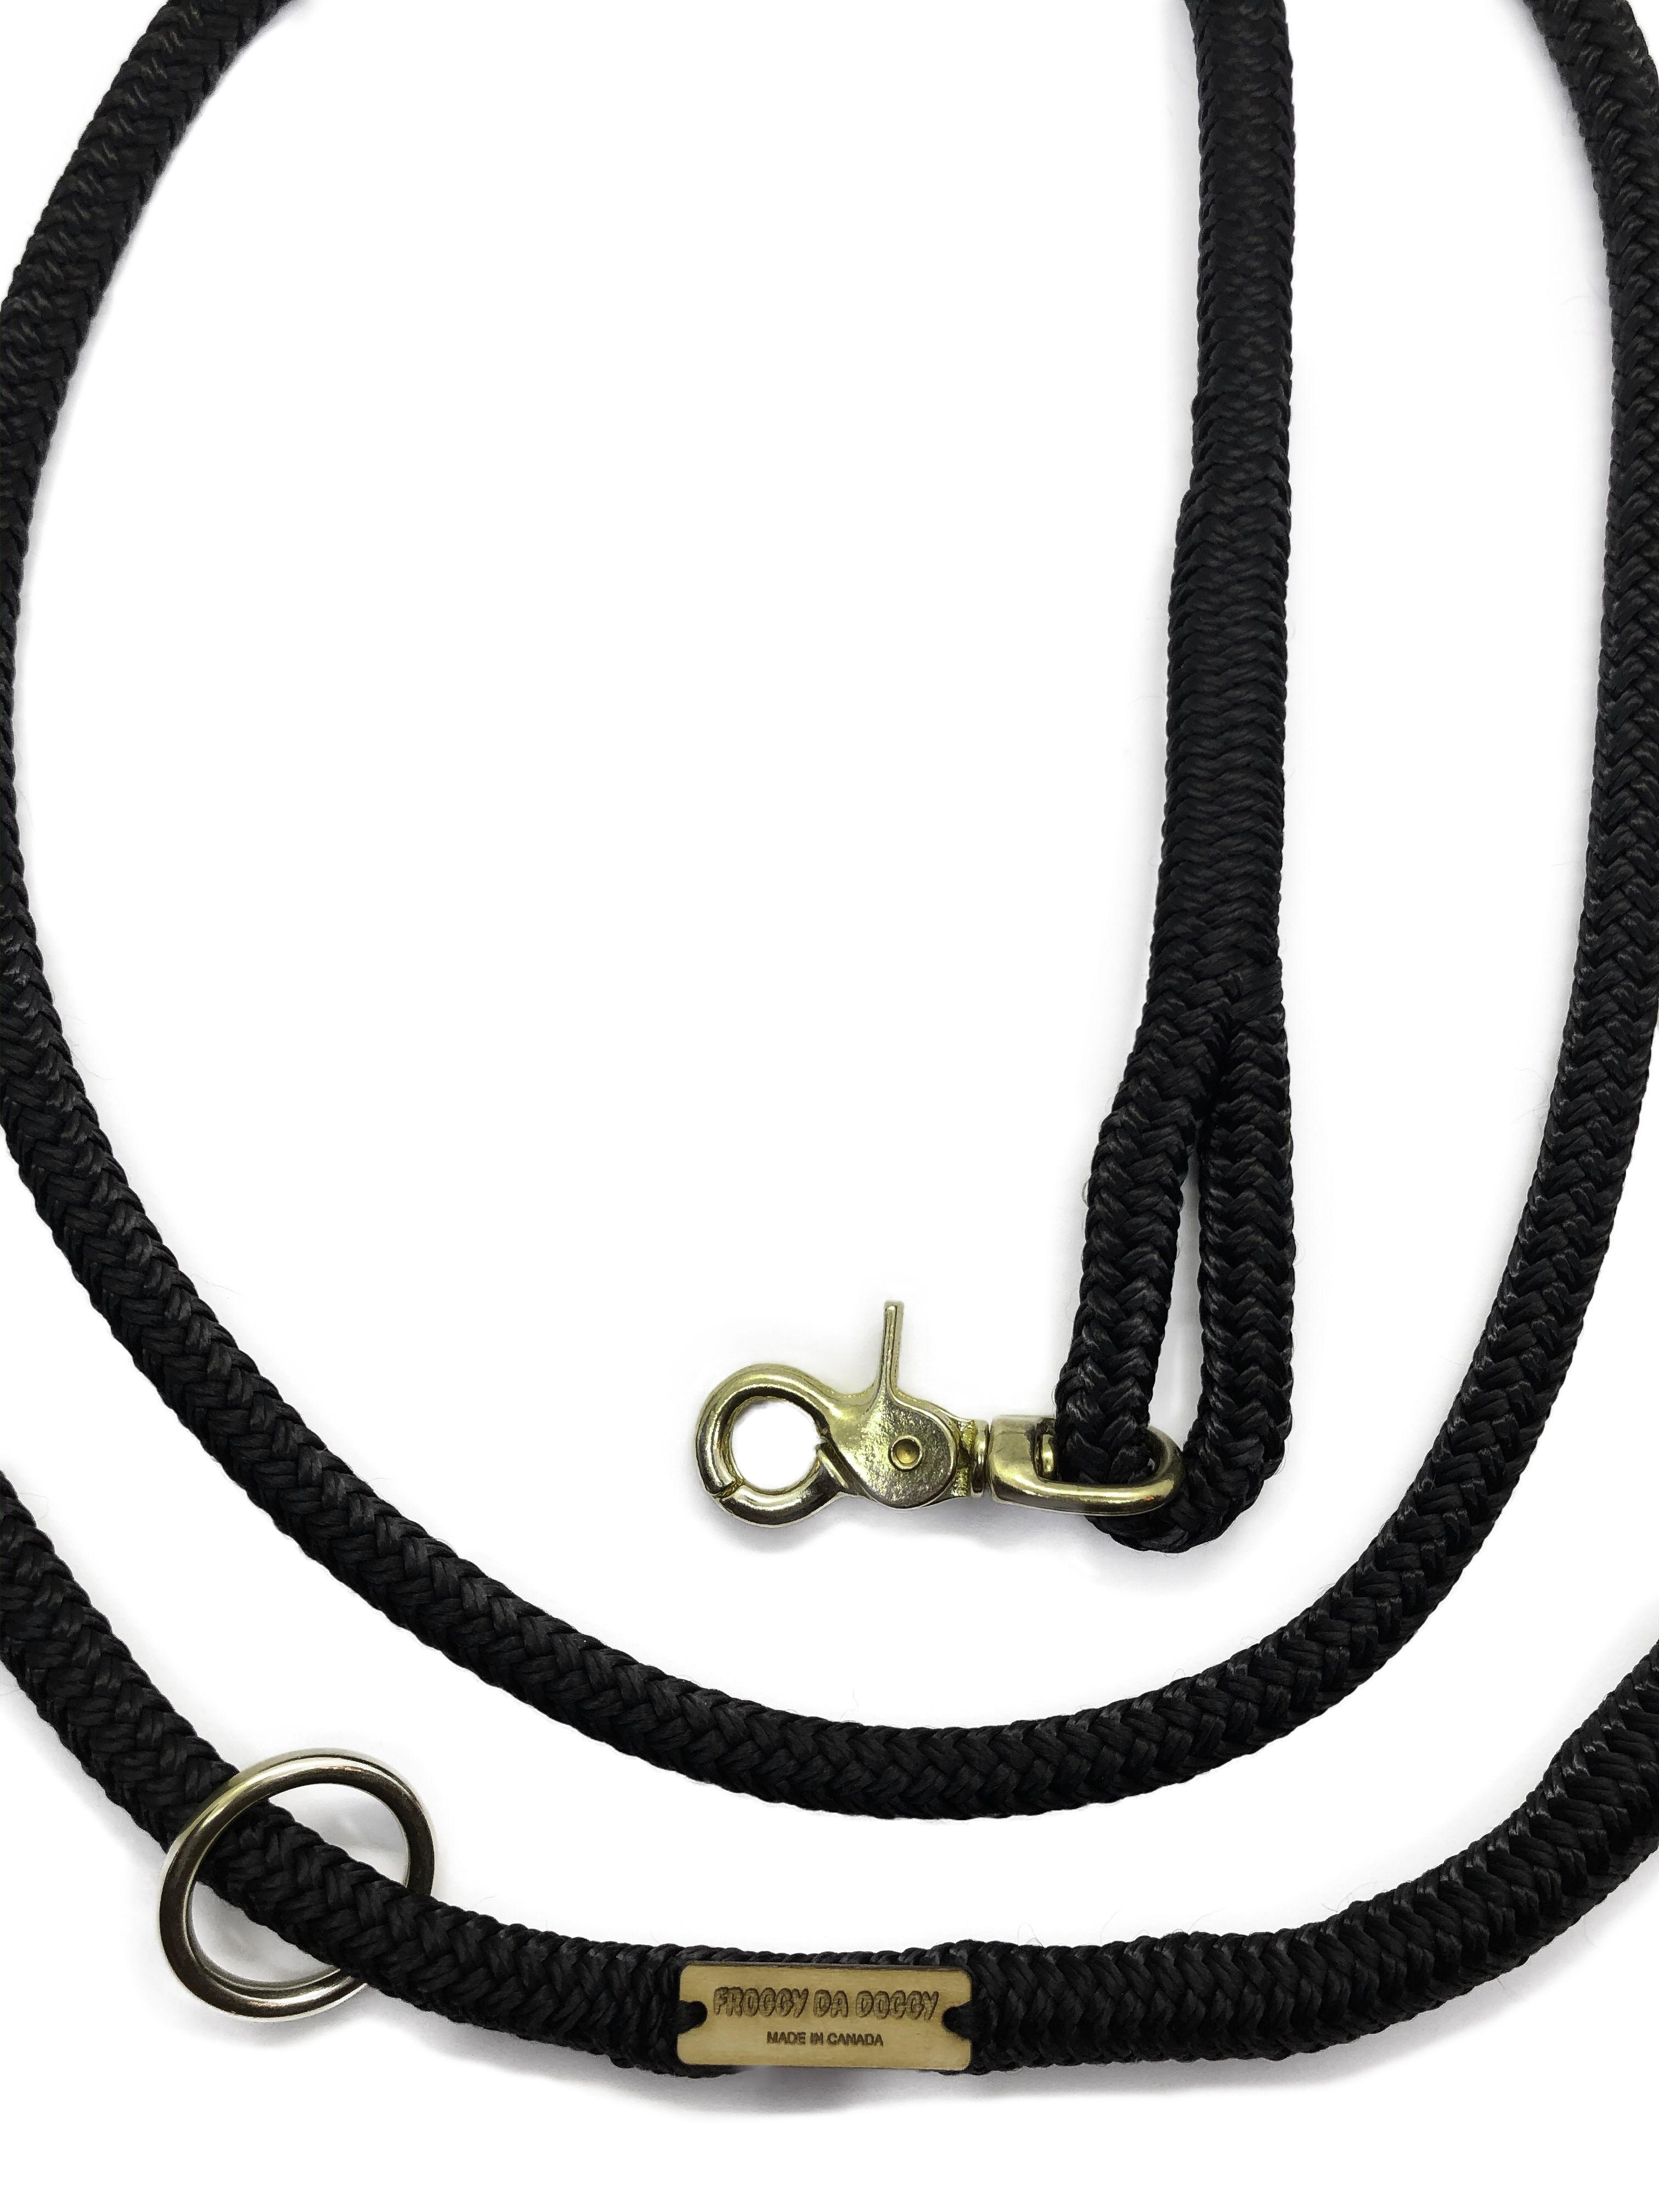 Black dog leash handsfree rope dog rope dog leash dog